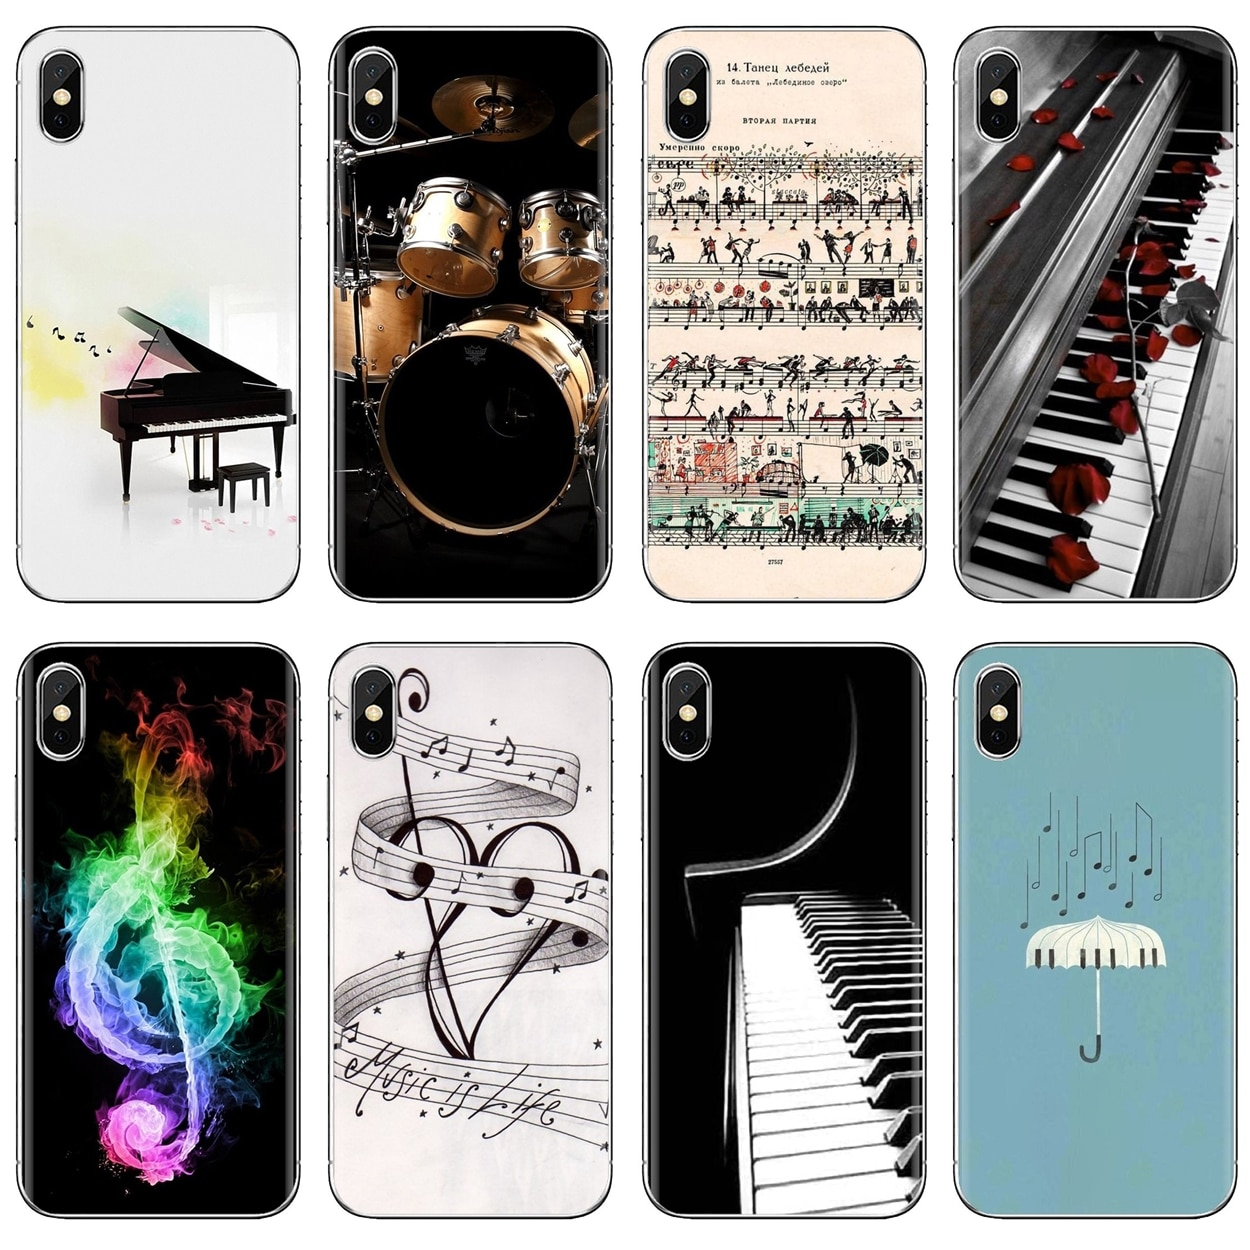 Nota musical de guitarra de Piano para Samsung Galaxy J1 J2 J3 J4 J5 J6 J7 J8 Plus 2018 Prime 2015 2016 2017 diseños europeos funda de teléfono de silicona